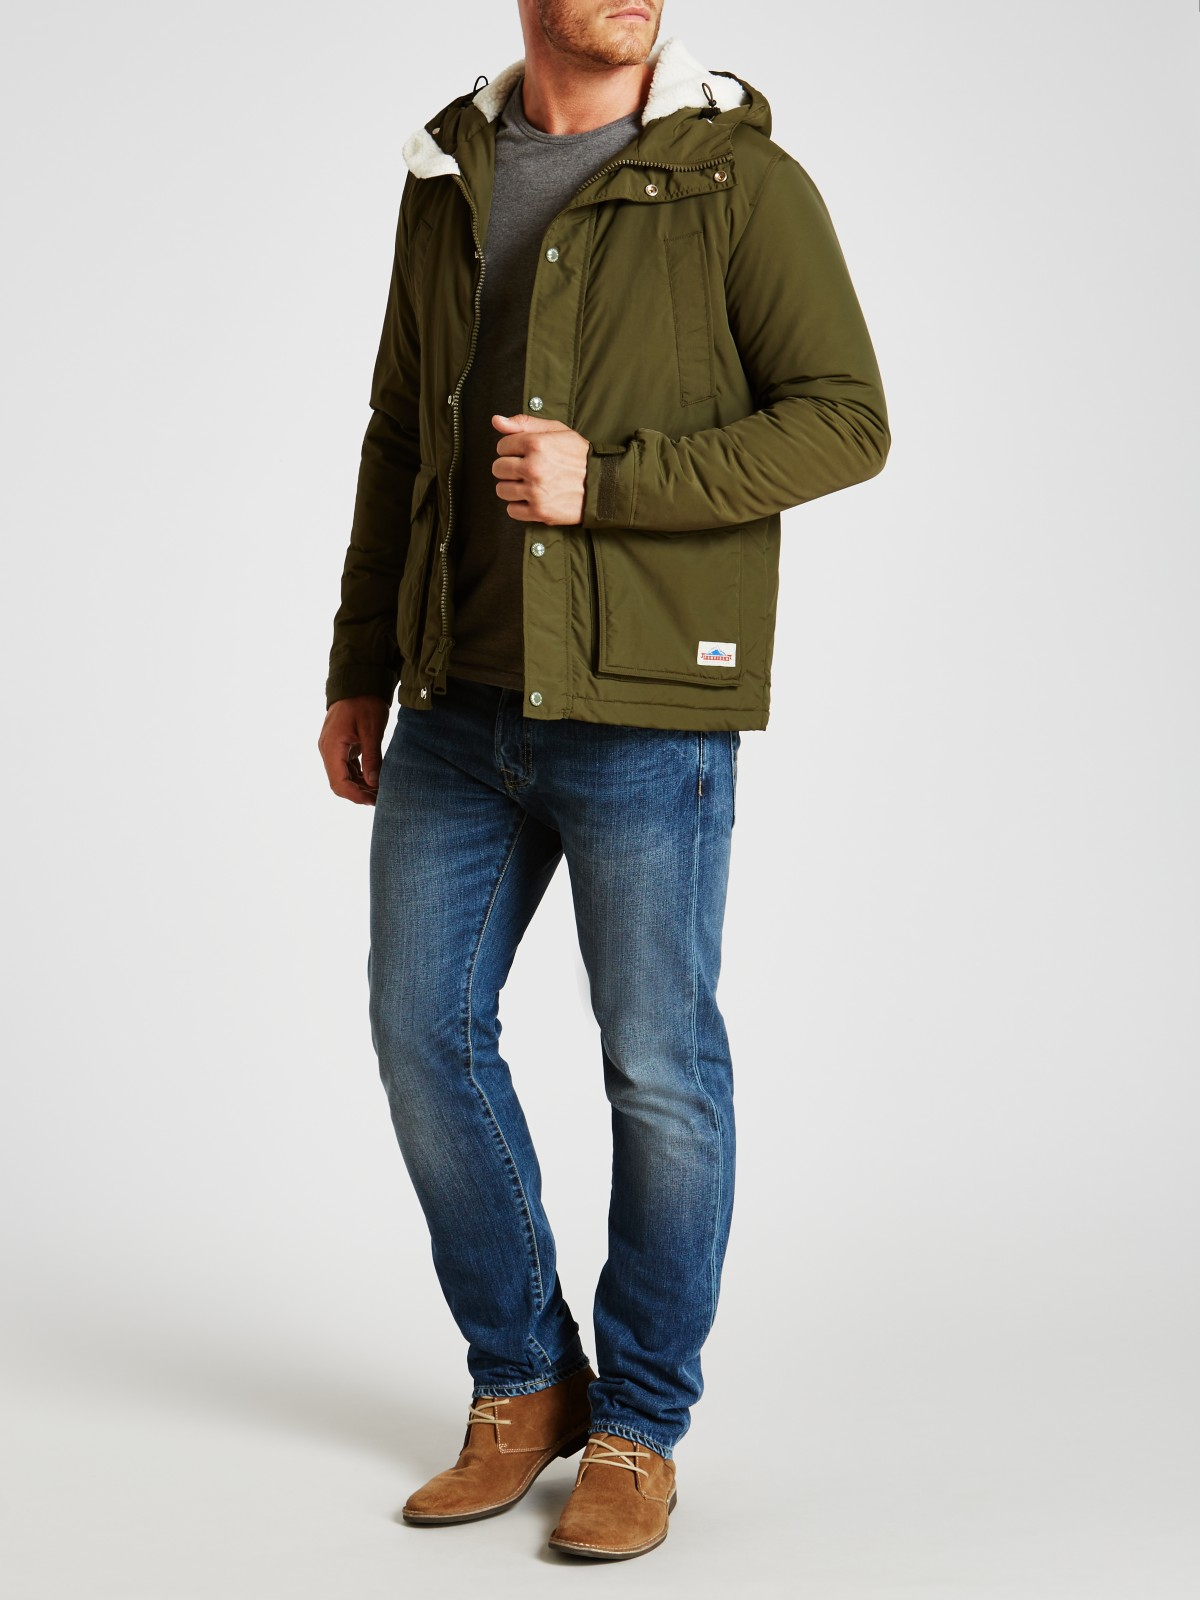 Penfield Denim Hosston Jacket in Olive (Green) for Men